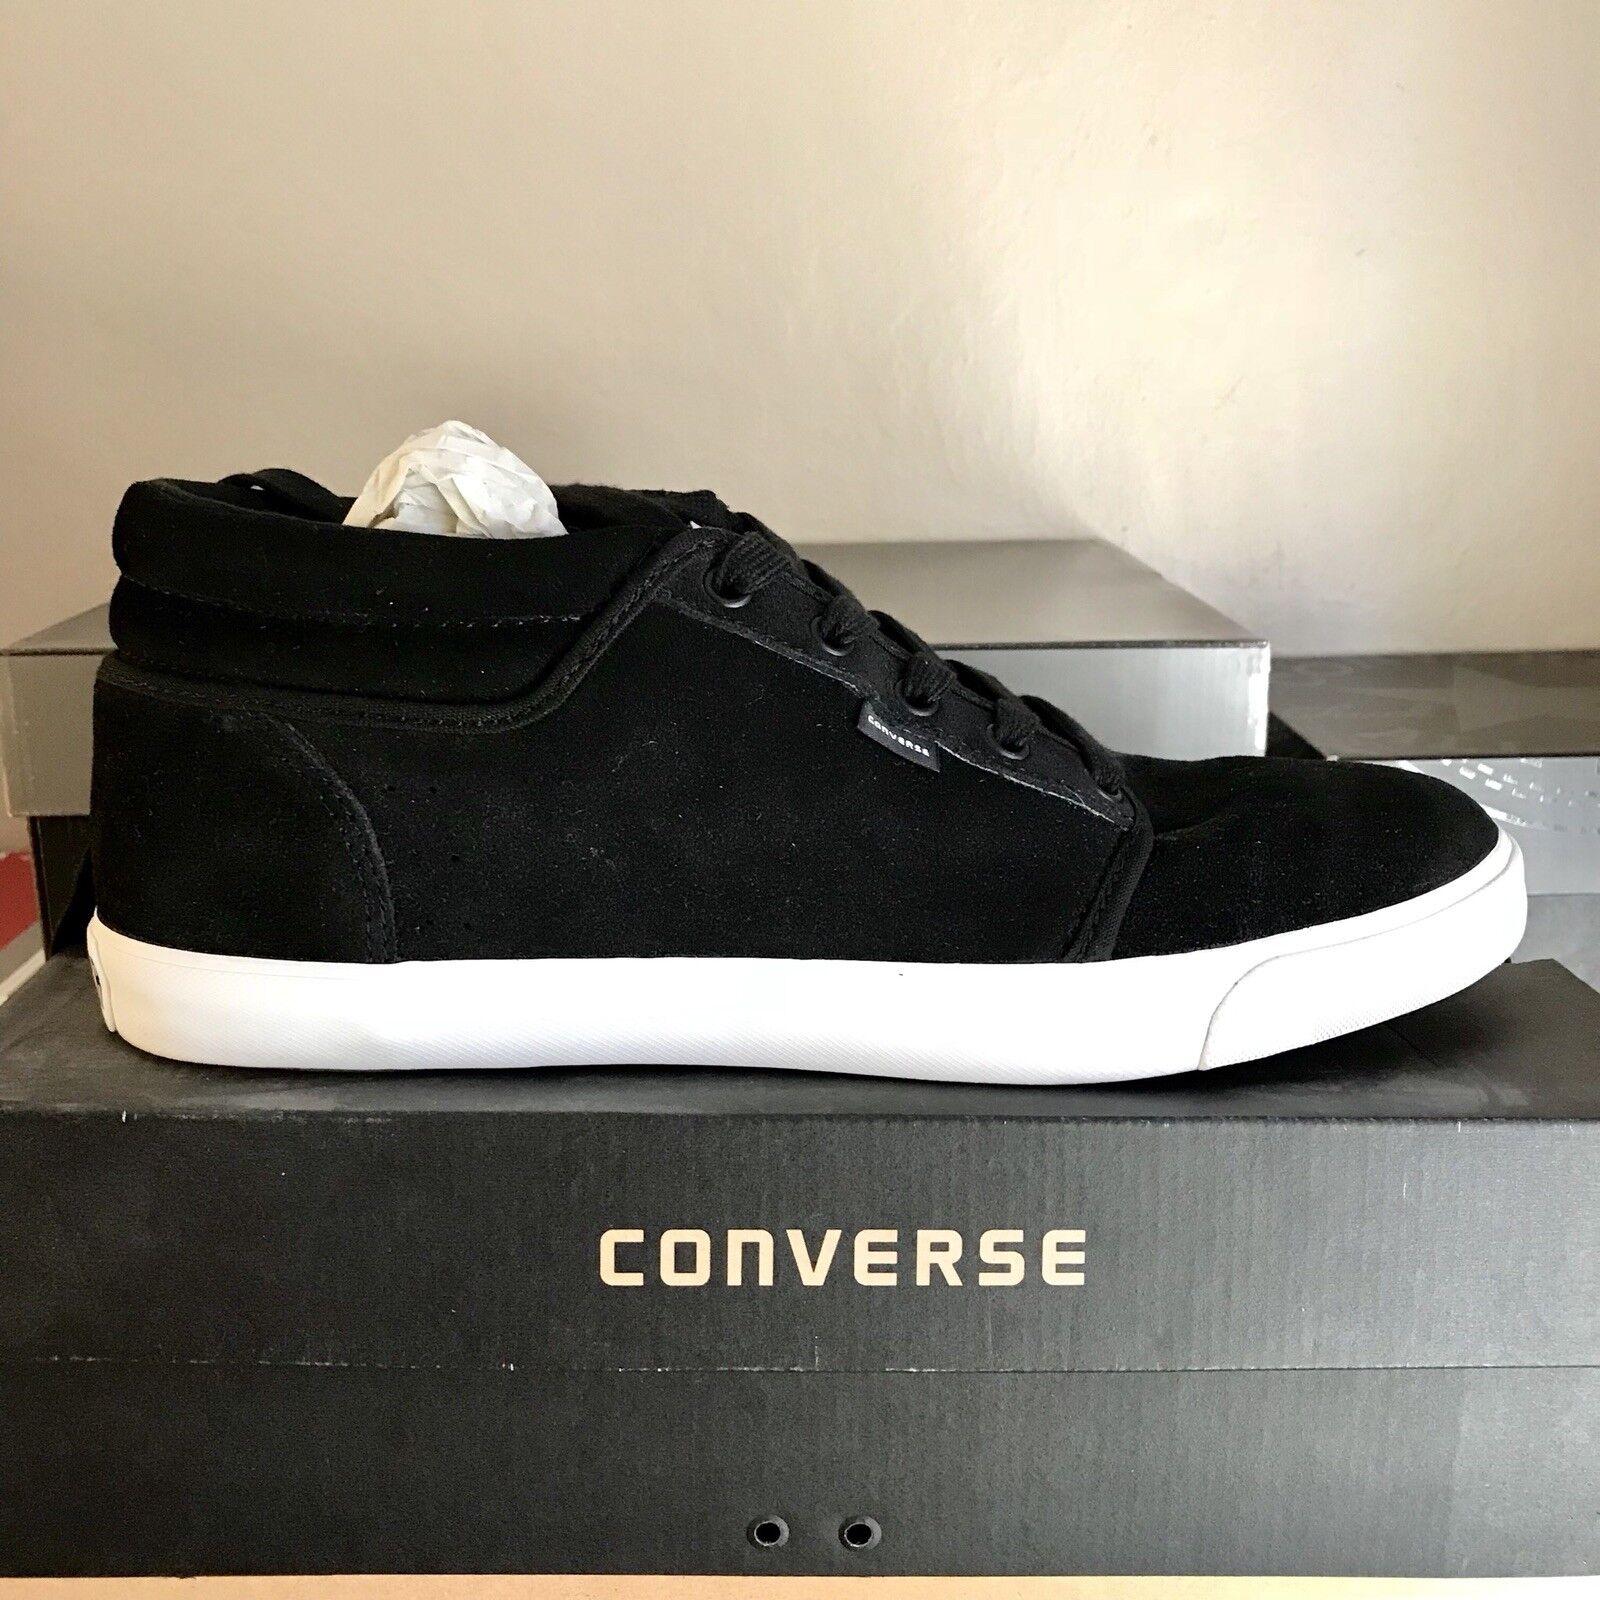 d5b0c7e10846 Mens Converse Silo Mid Mid Mid Black Suede Shoes Sz 12 f3e2ea ...